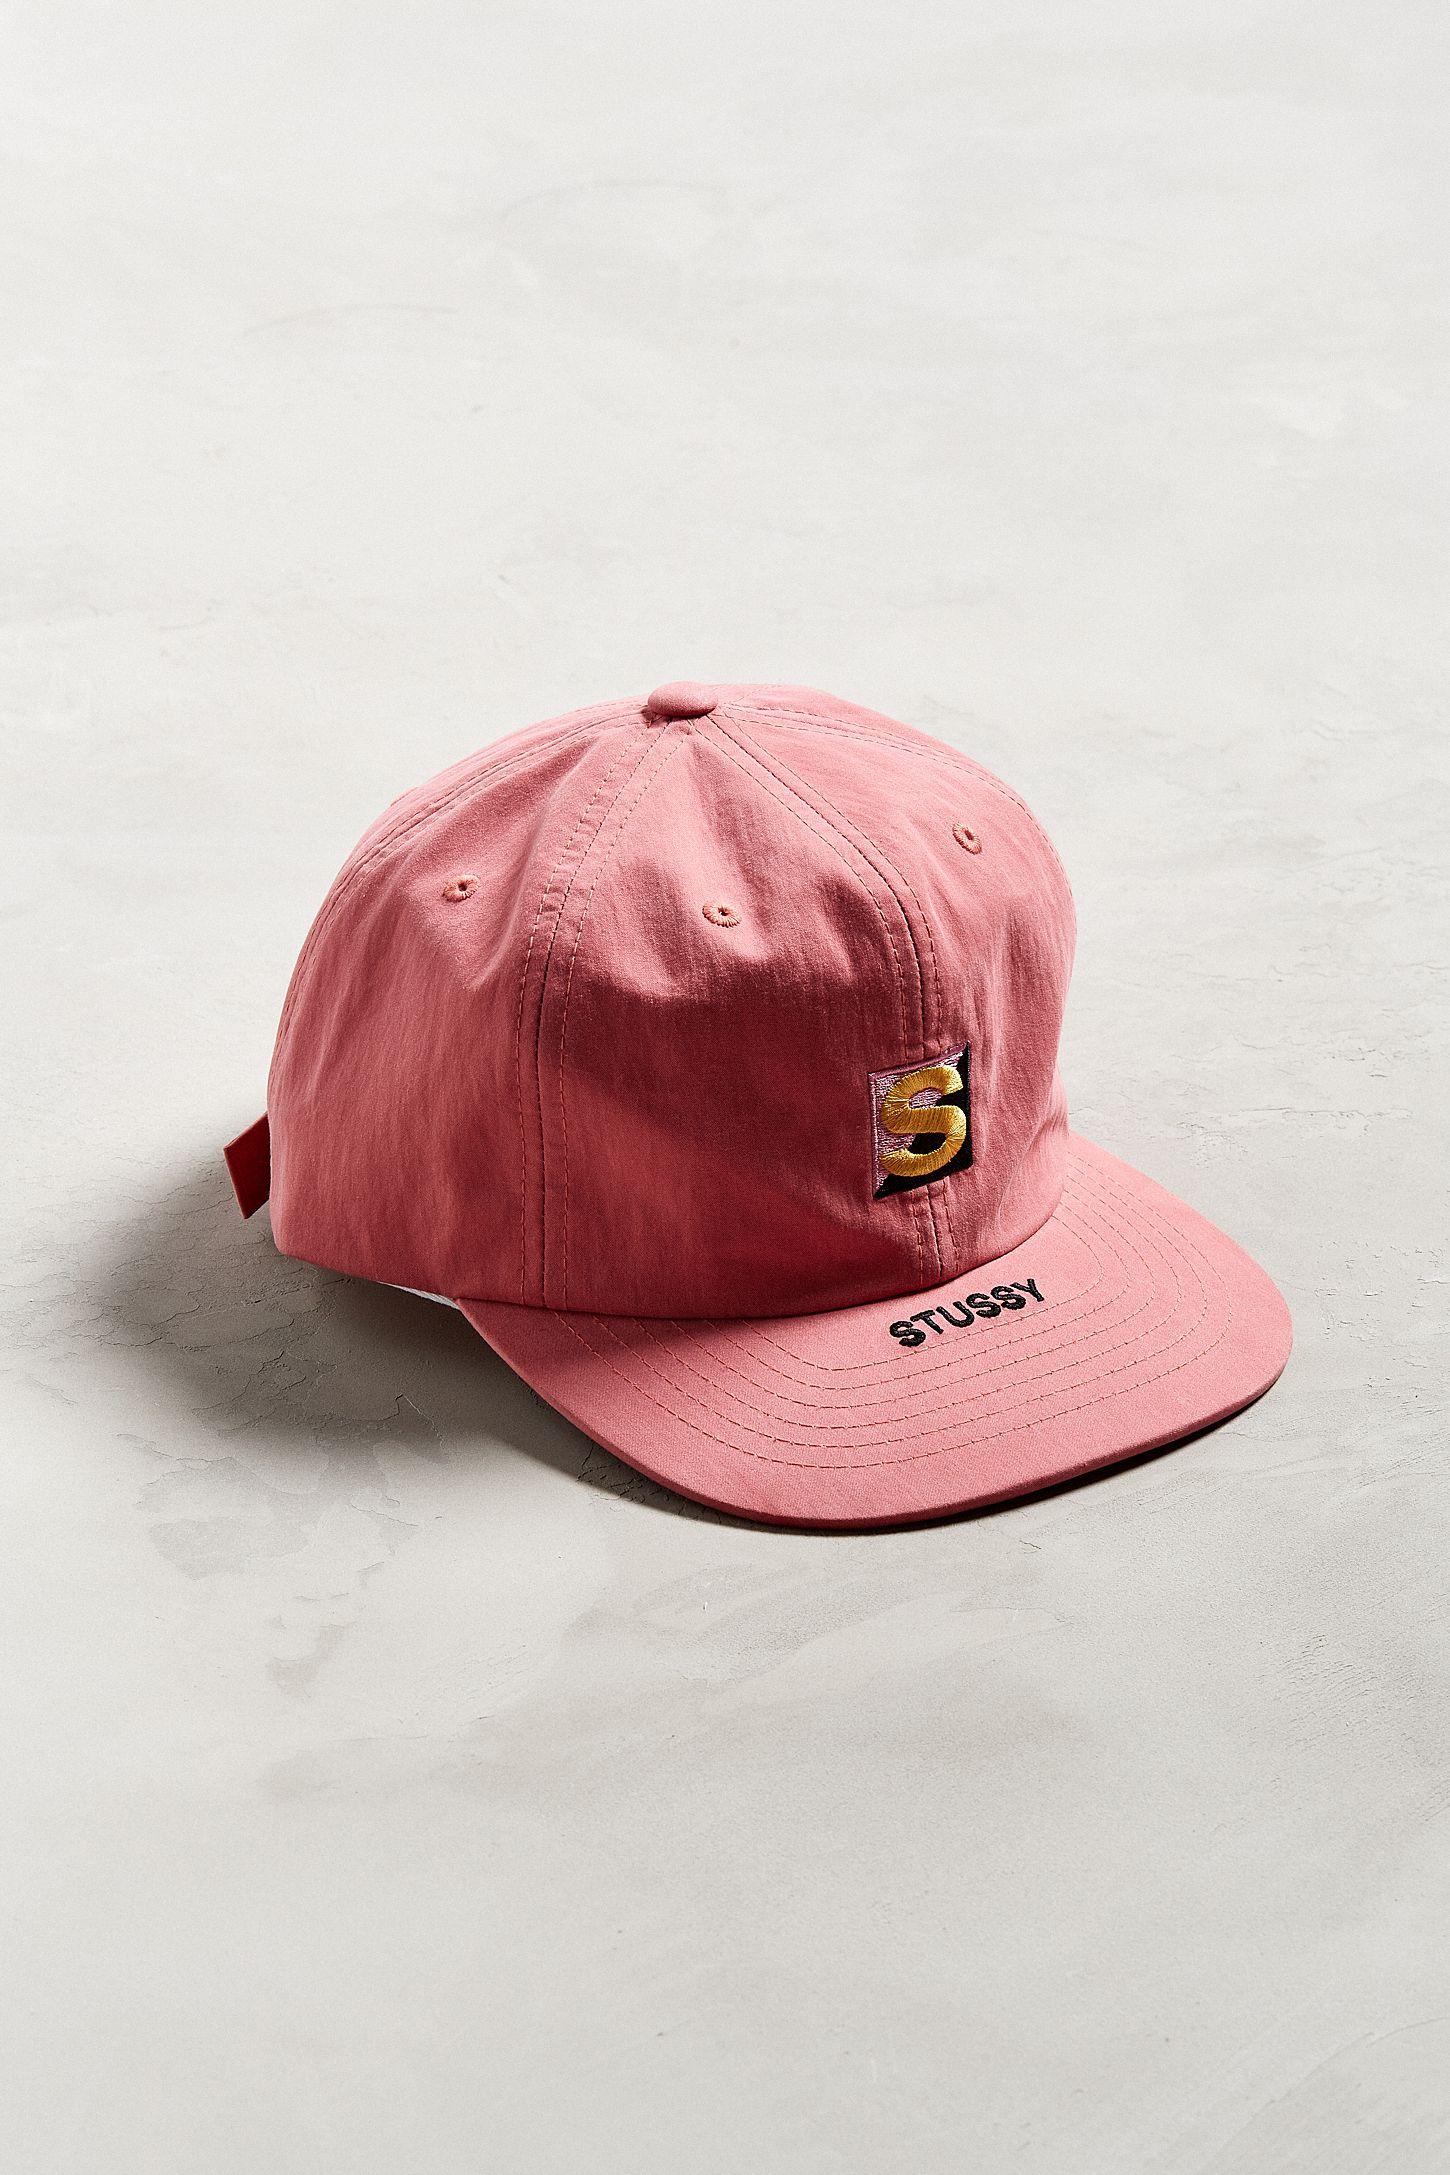 5cfca96118d Stussy Cotton Nylon Strapback Hat